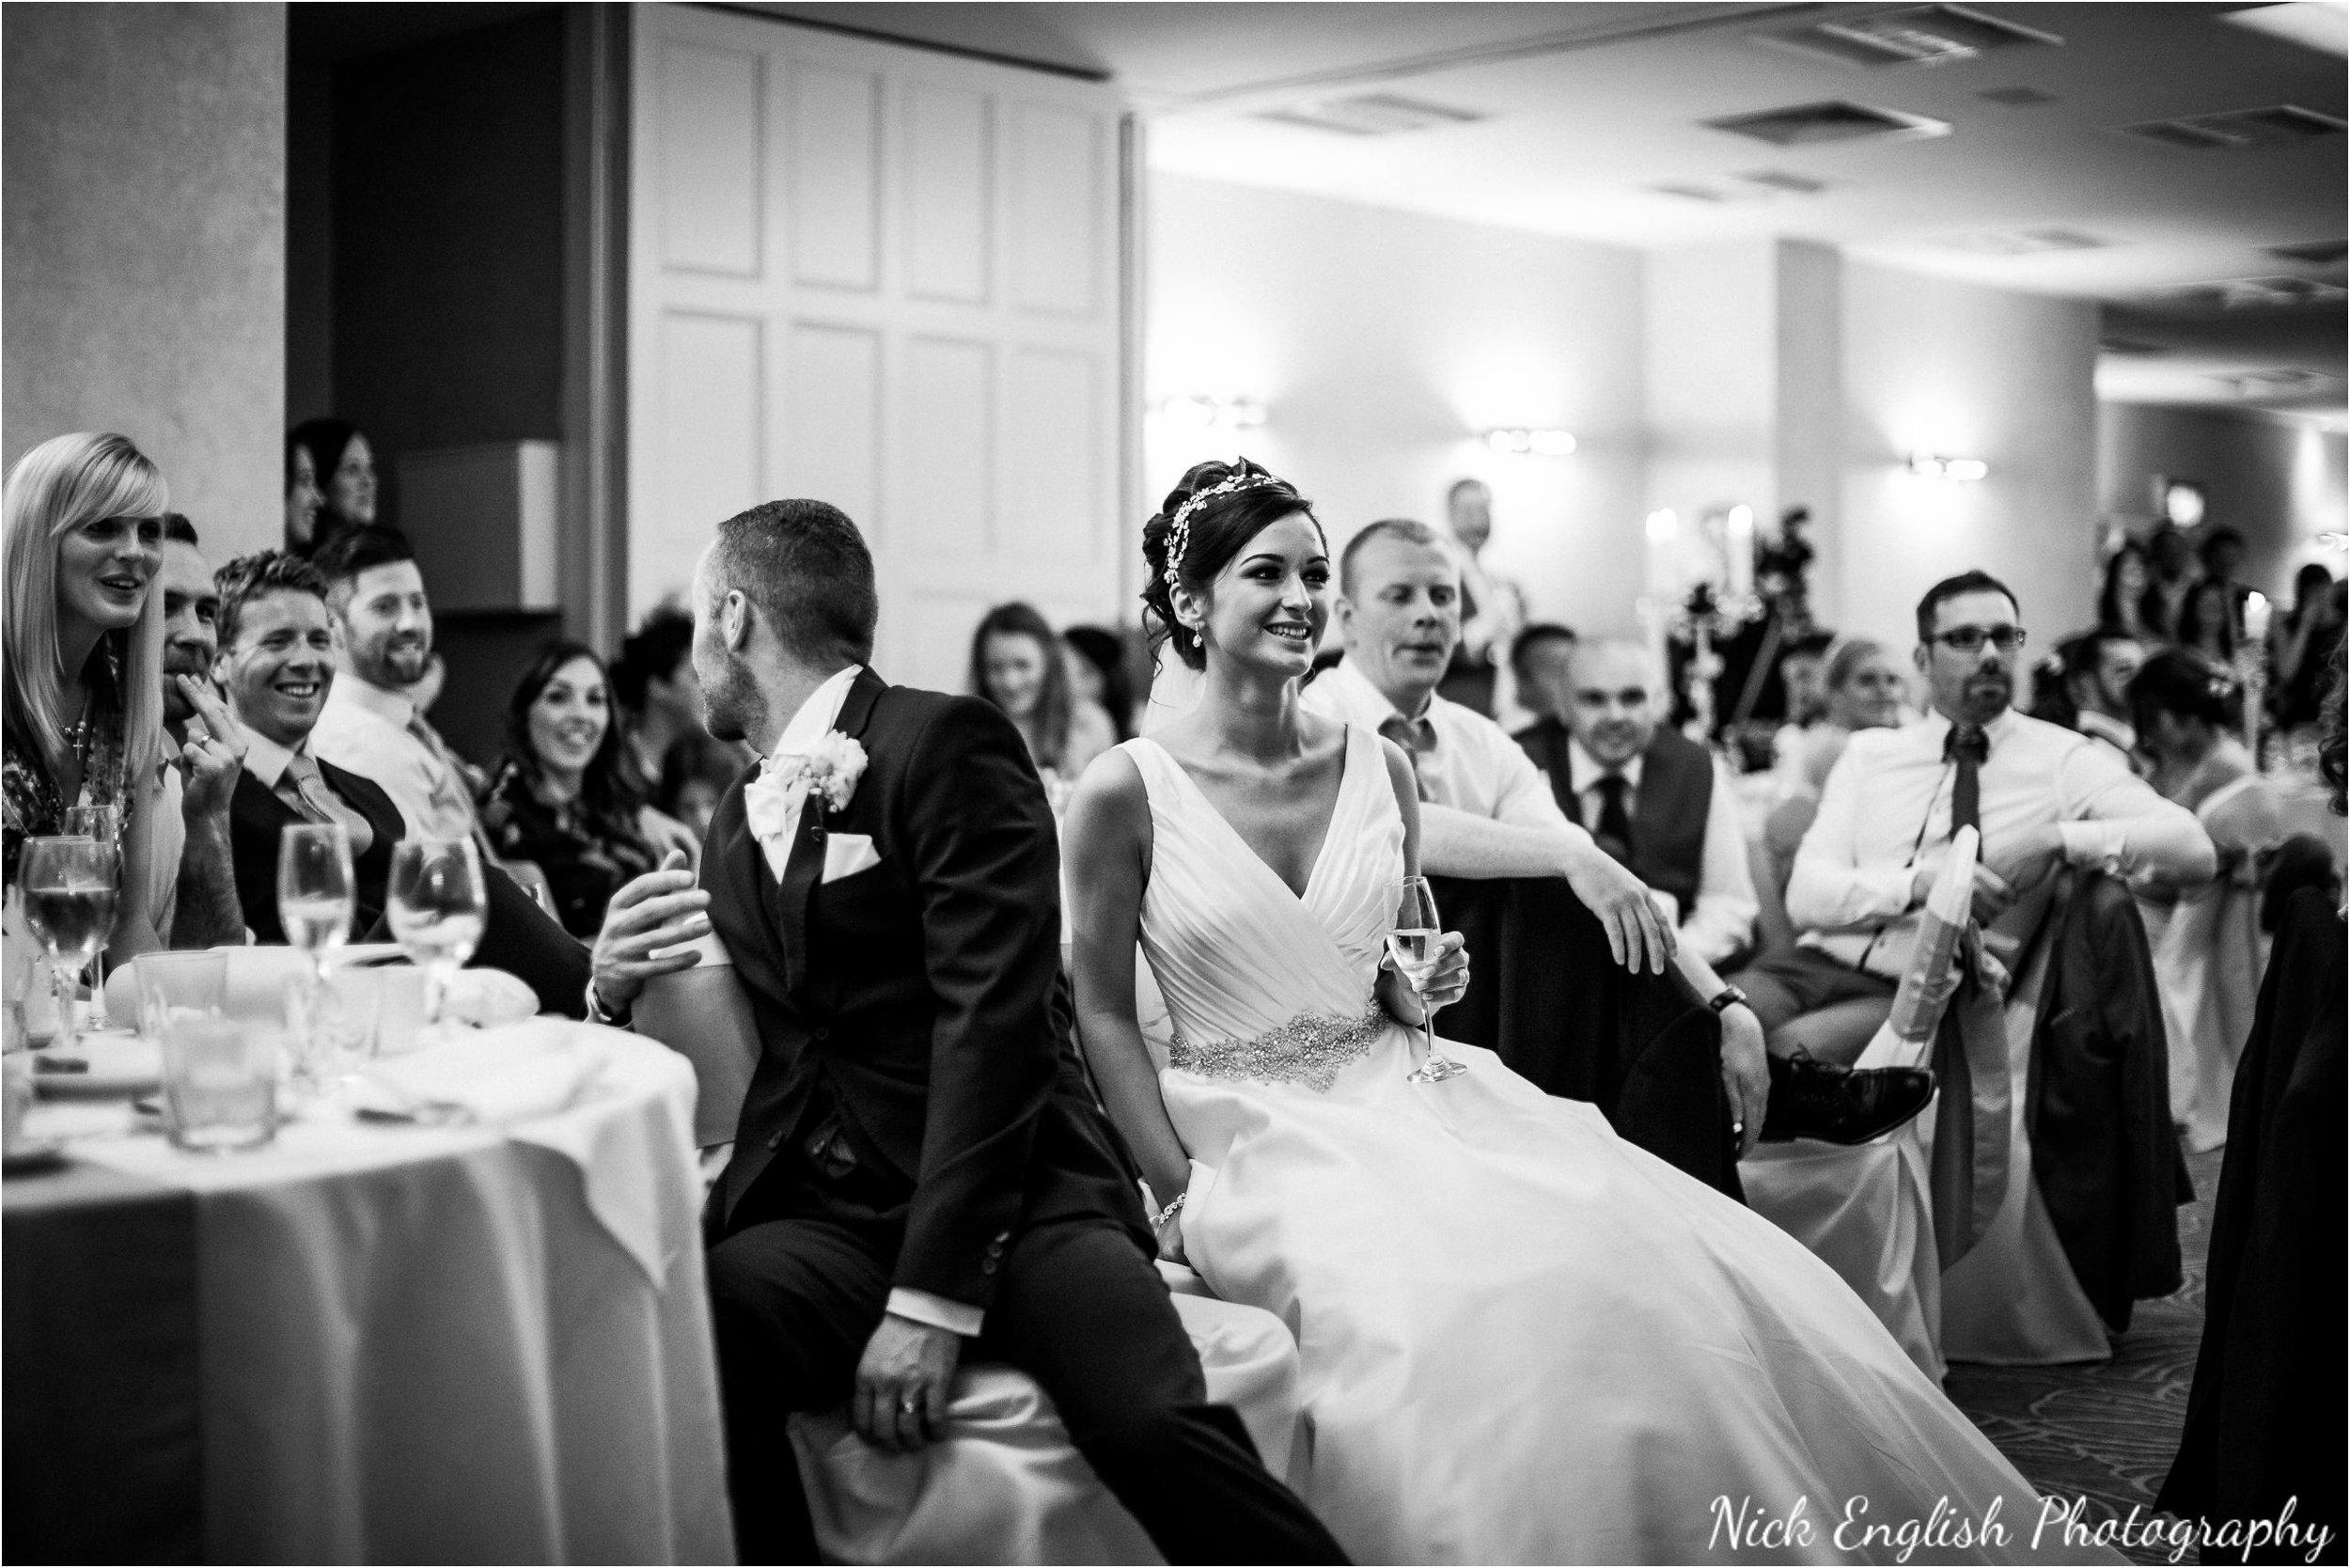 Emily David Wedding Photographs at Barton Grange Preston by Nick English Photography 179jpg.jpeg